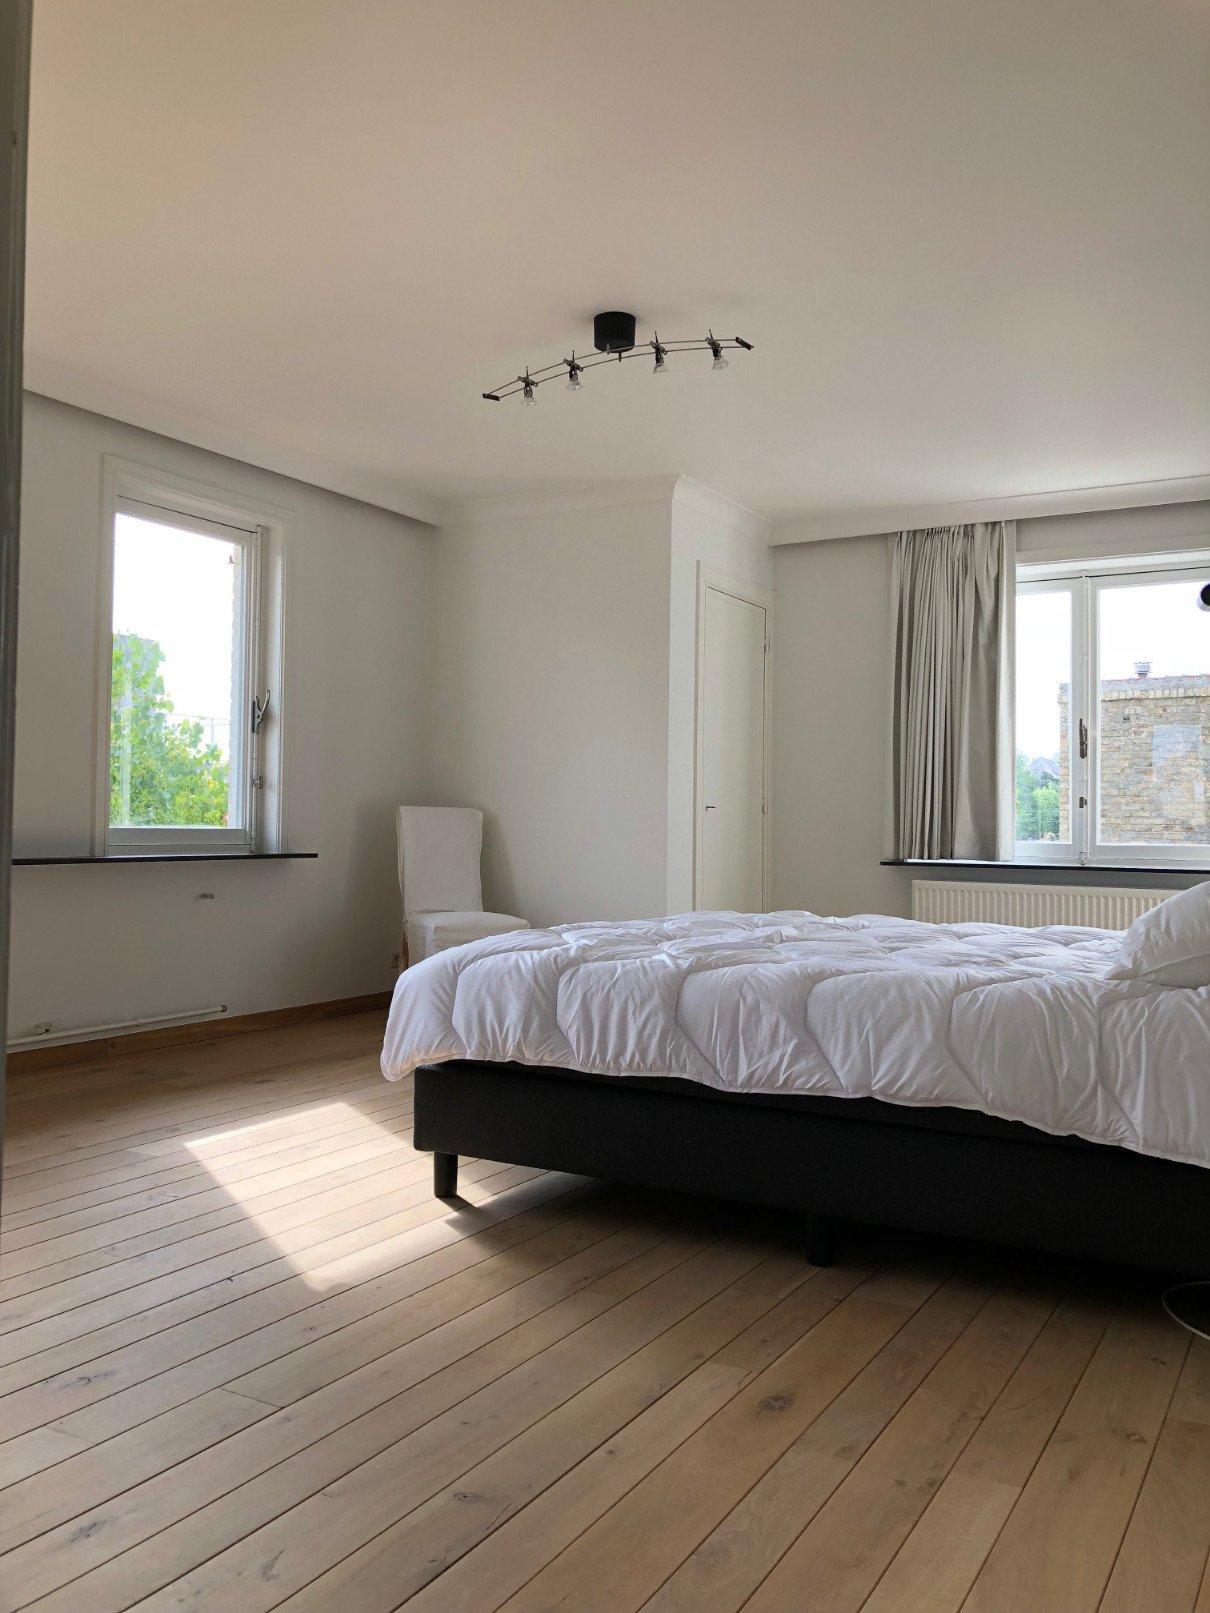 Rietveldprojects-Villa Were Di - Te Koop : Te Huur (per week)11